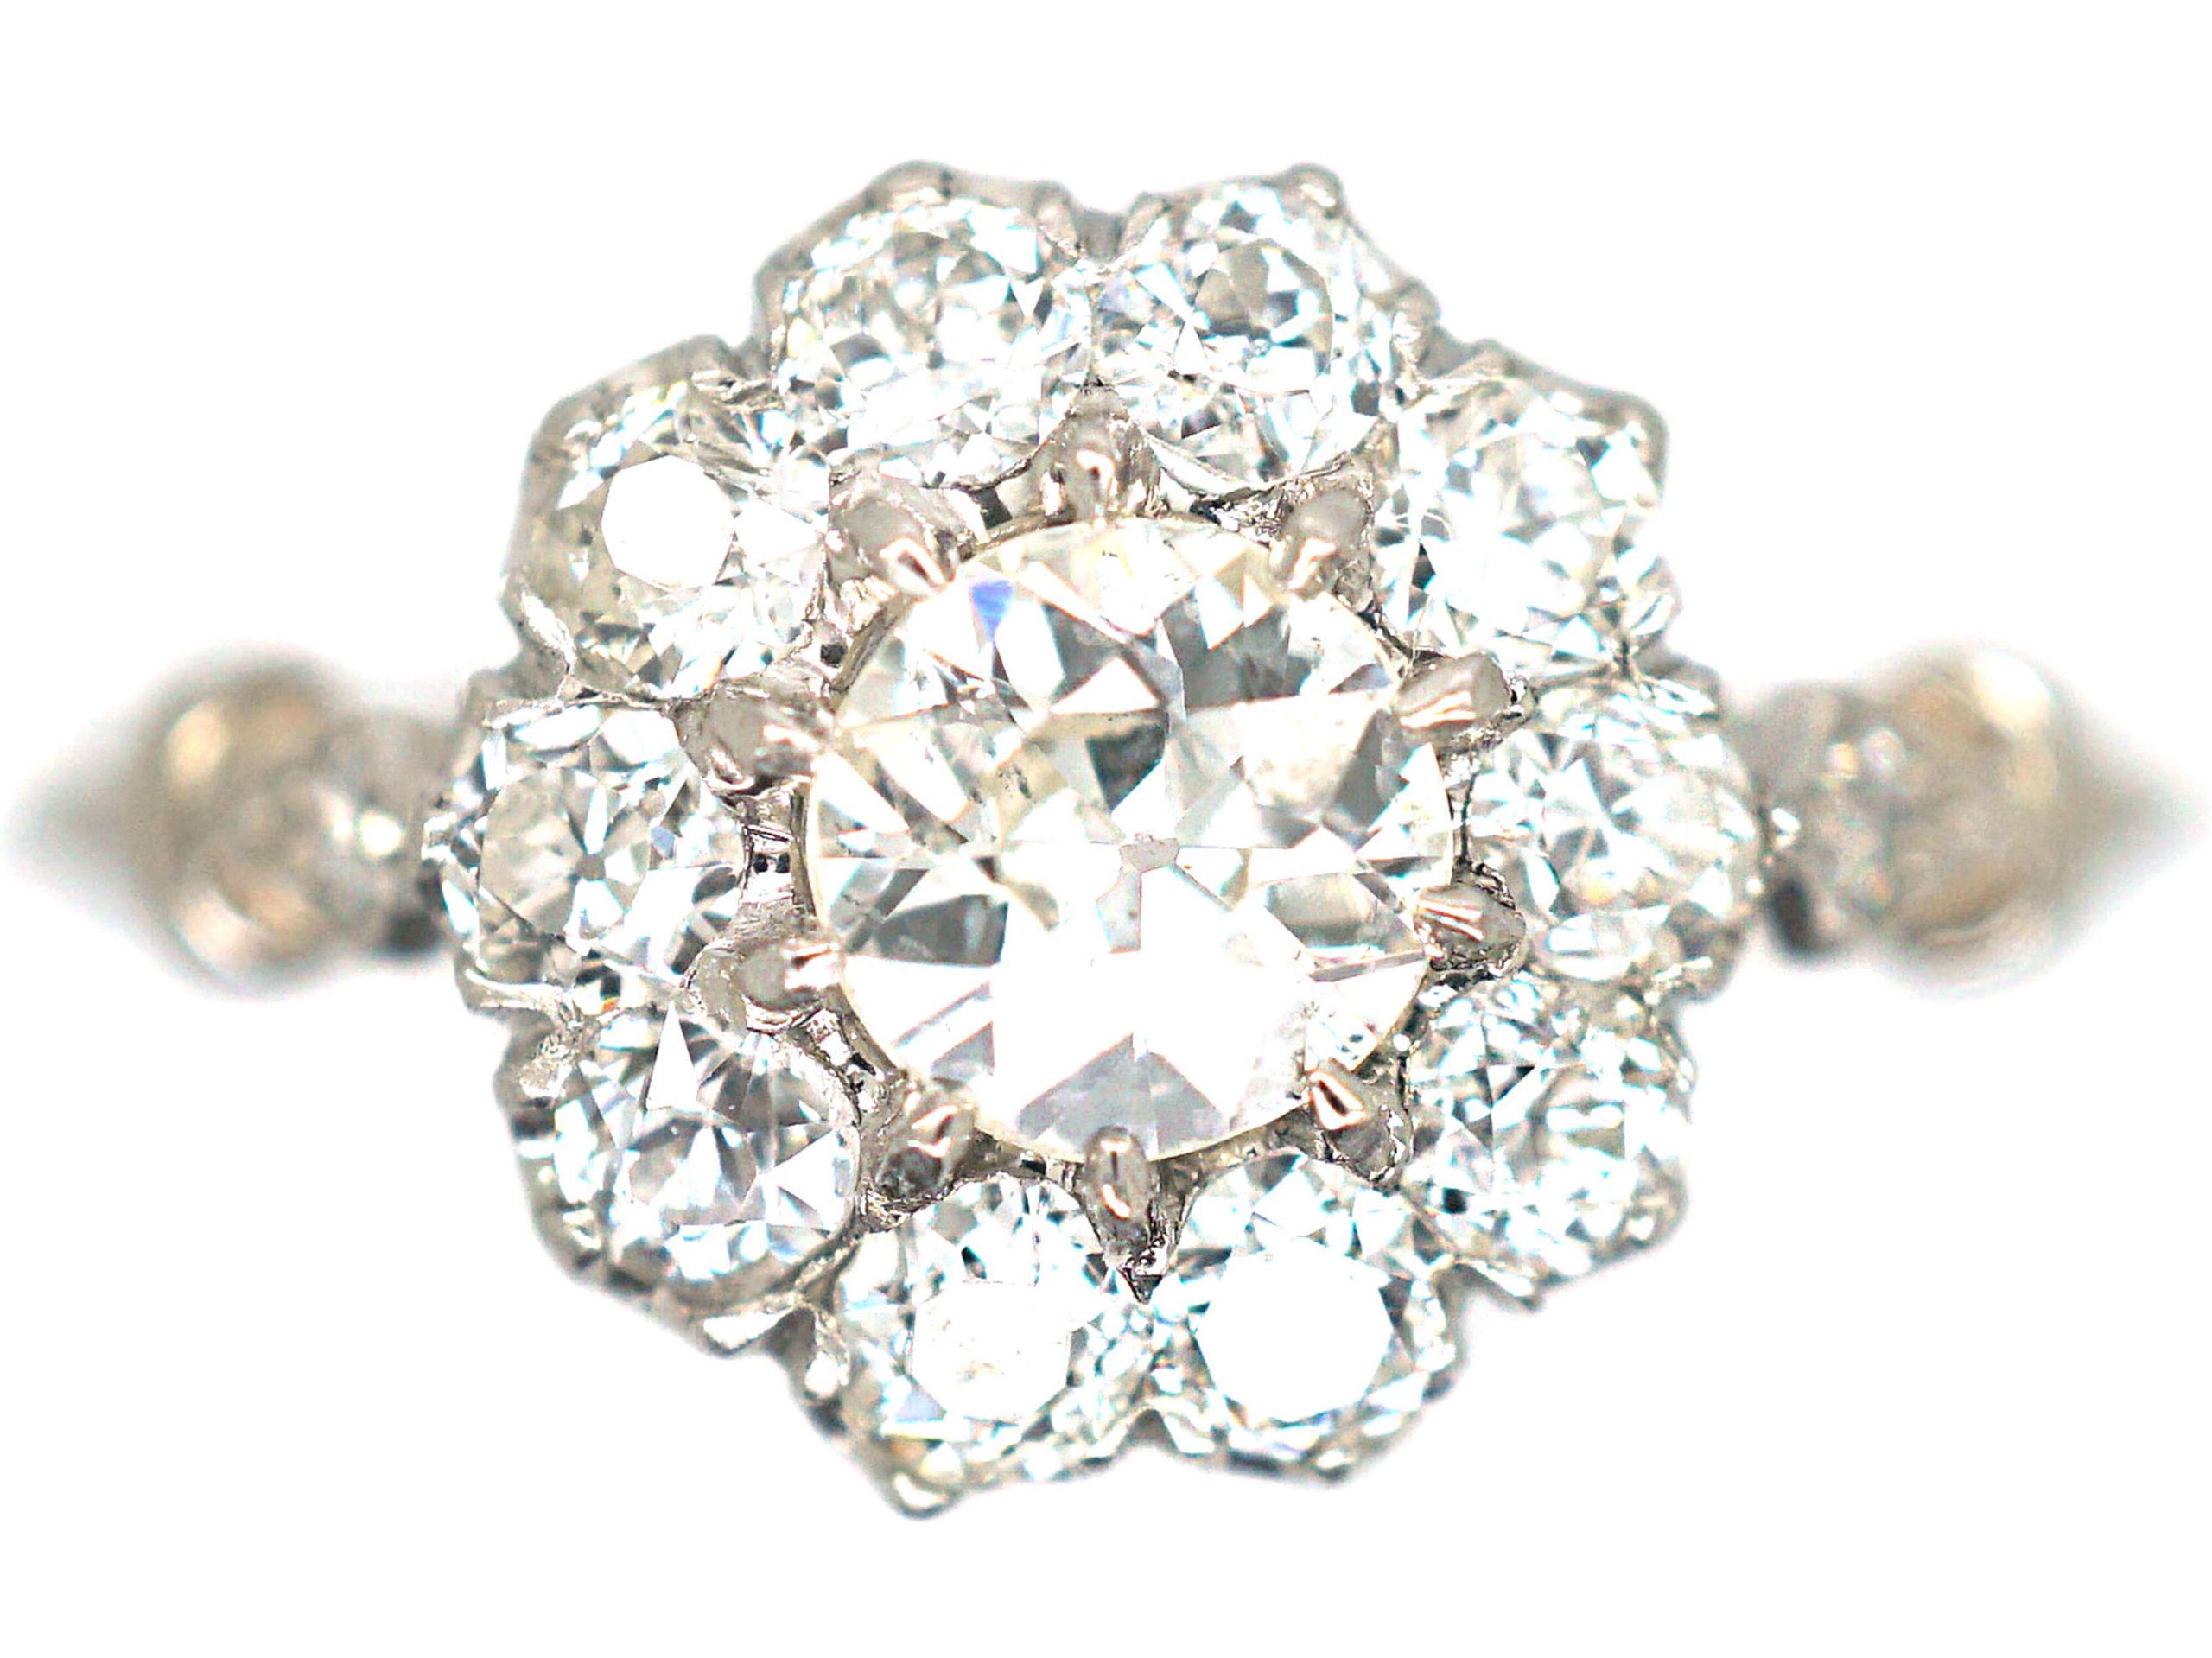 Edwardian Platinum & Diamond Cluster Ring with Diamond Set Shoulders